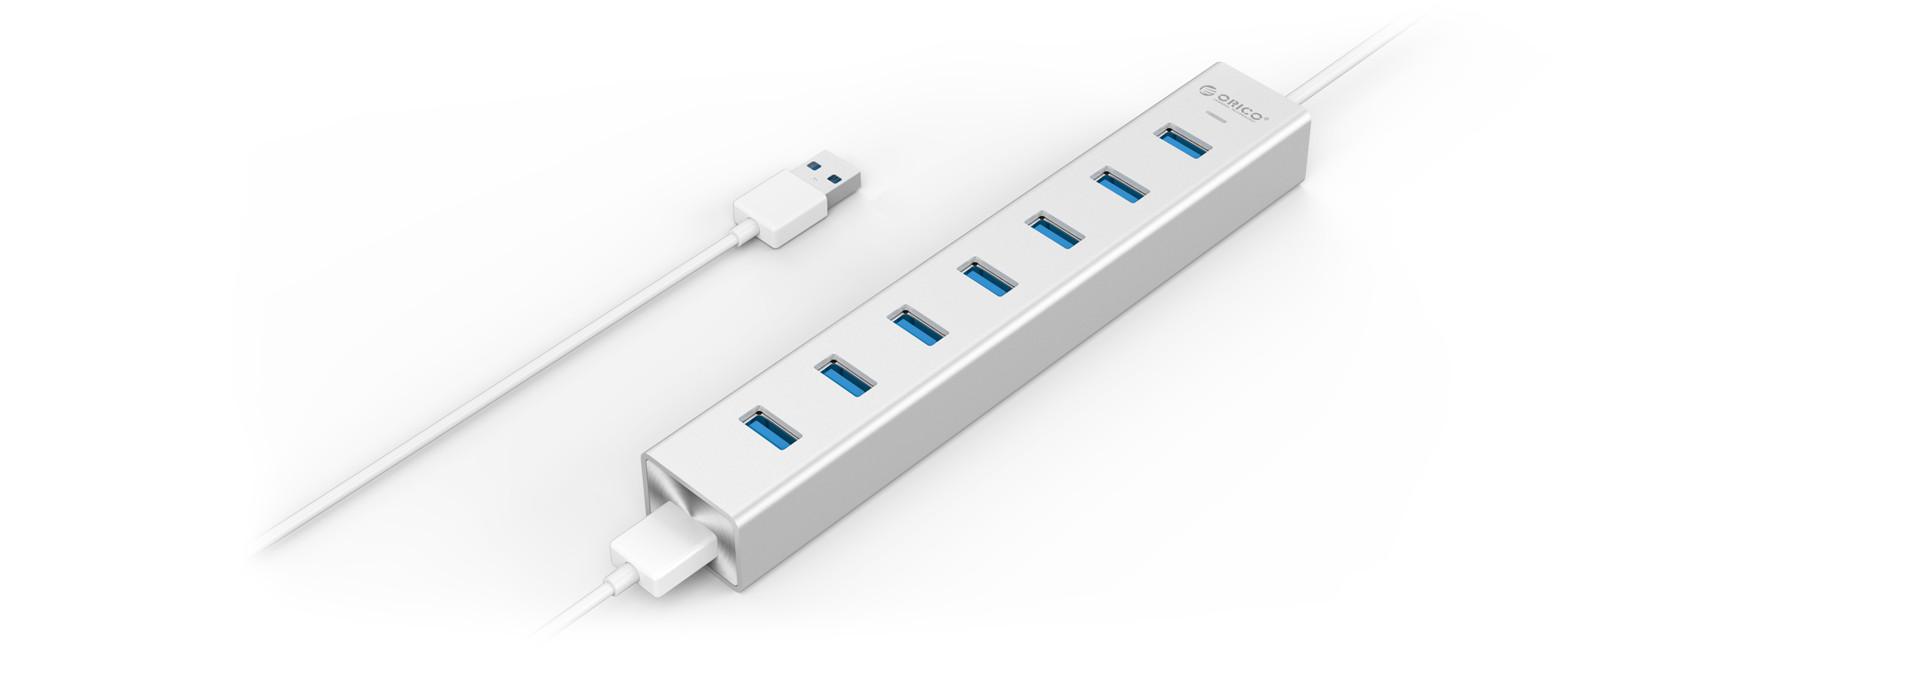 Orico H7013 U3 Sv Alumium 7 Ports Usb30 Hub Usb 4 Port Df4u Ultra Mini 30 Magnesium Aluminum Alloy The Same As Mac Products